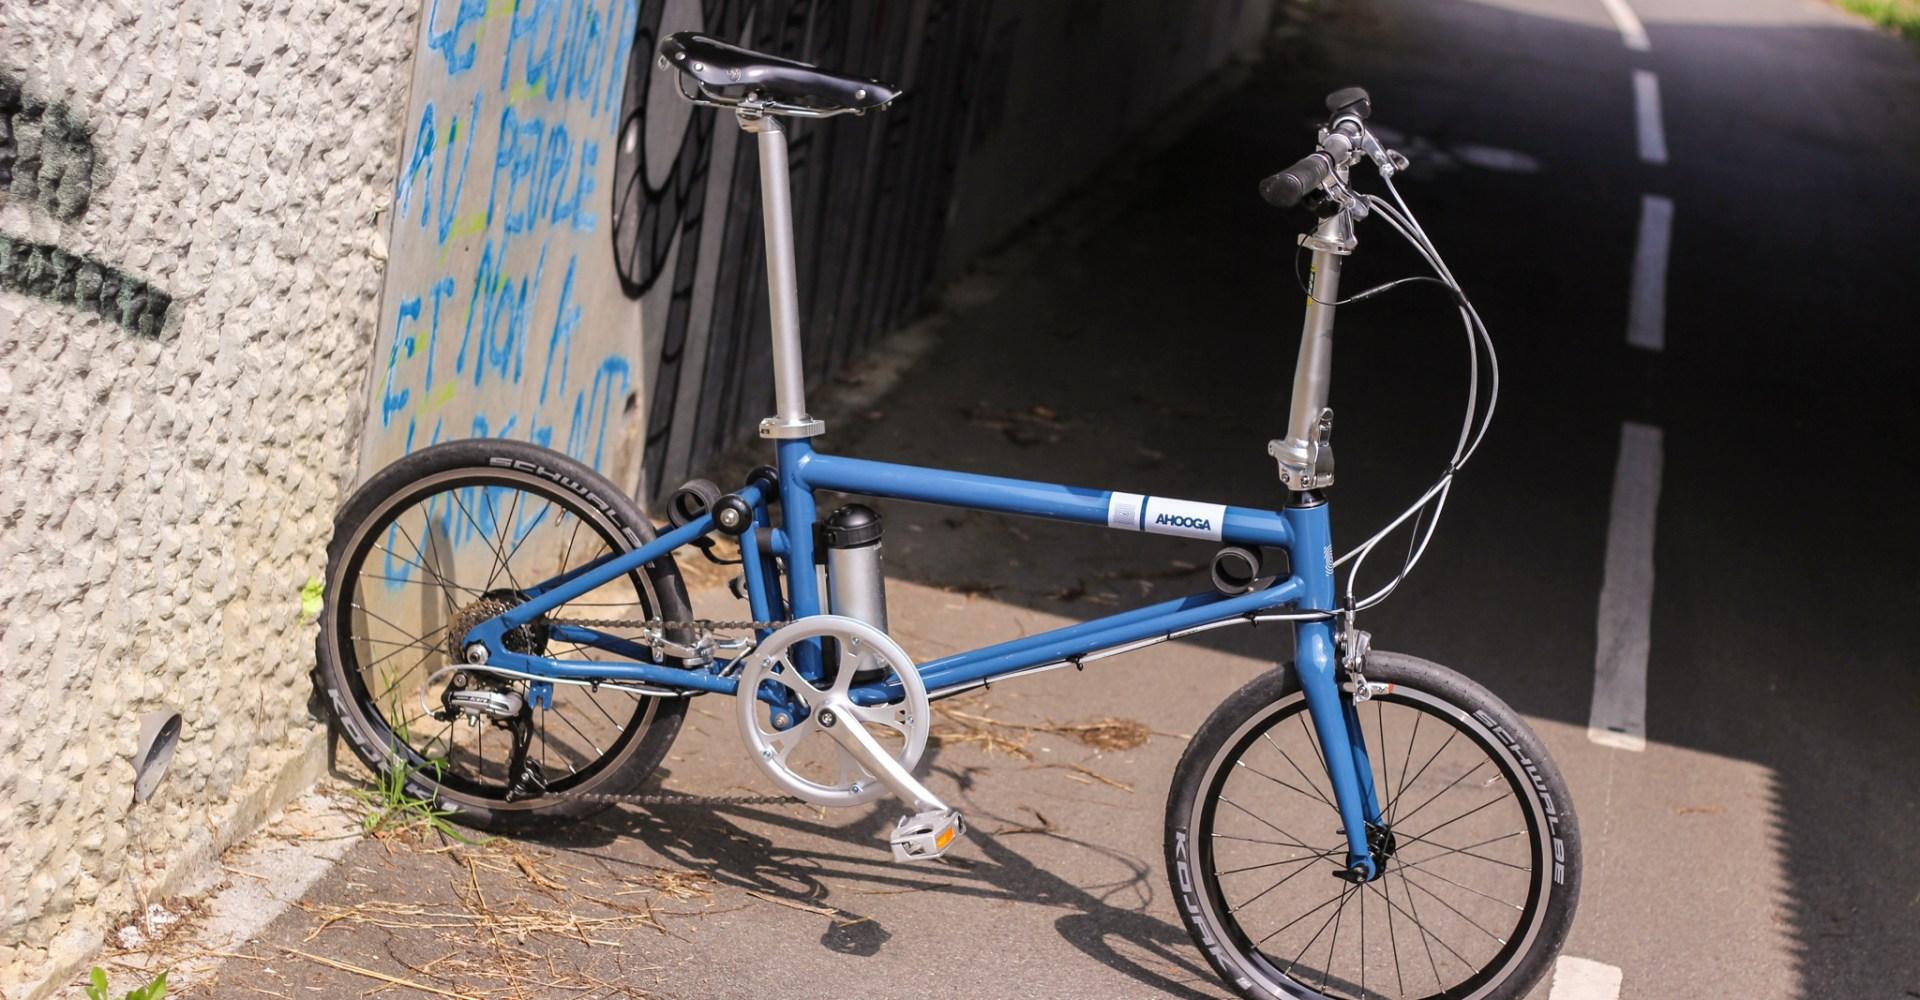 [Test] Ahooga Bike, le vélo pliant belge